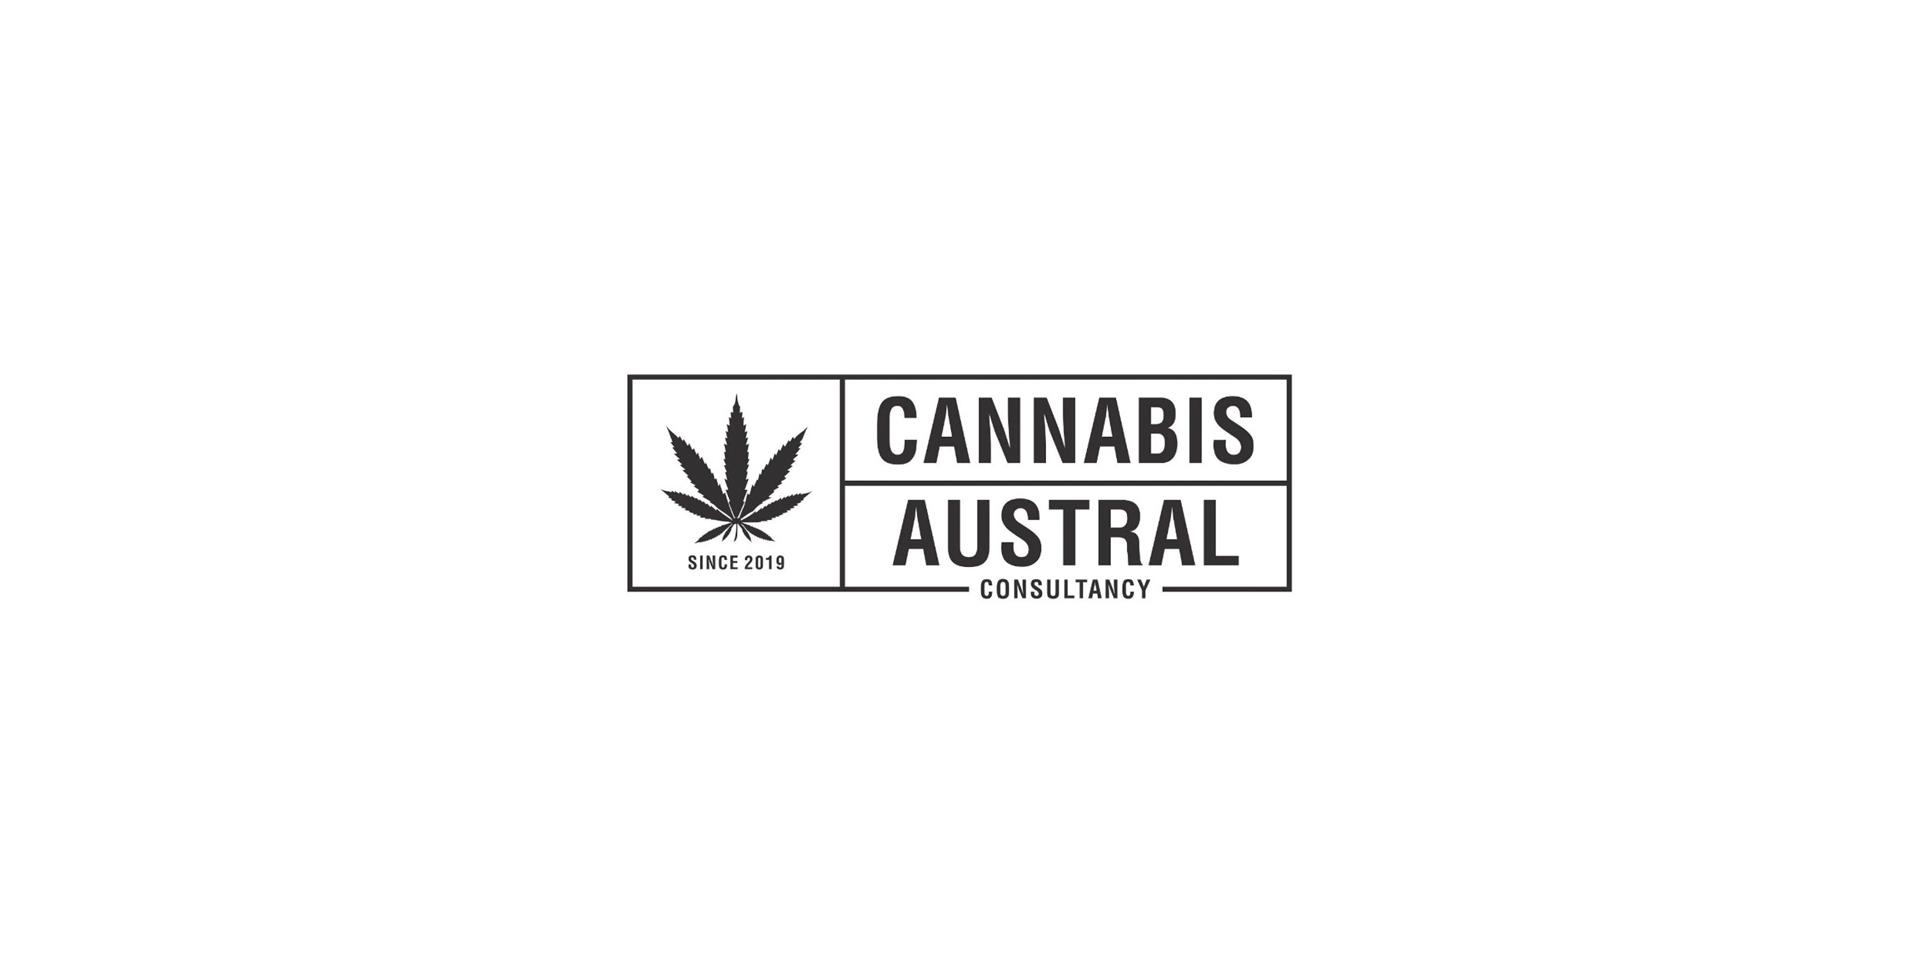 Cannabis Austral Consultancy